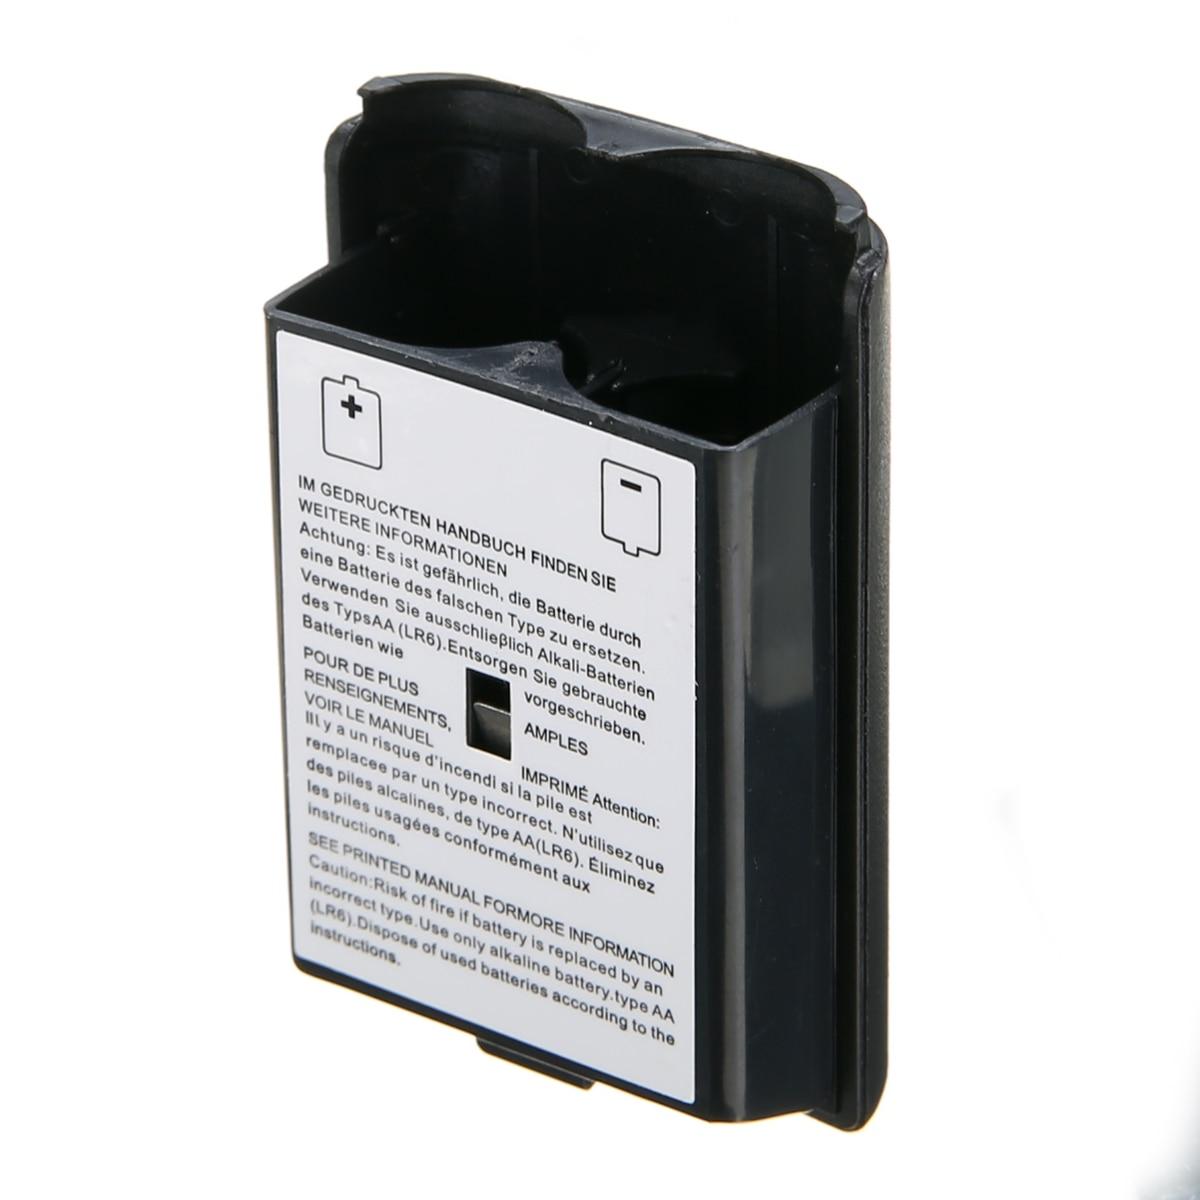 1 pc New Arriwal Preto Tampa Da Bateria AA Suporte Da Bateria de Plástico ABS Shell Case para XBOX 360 Controlador de Jogo Sem Fio acessórios